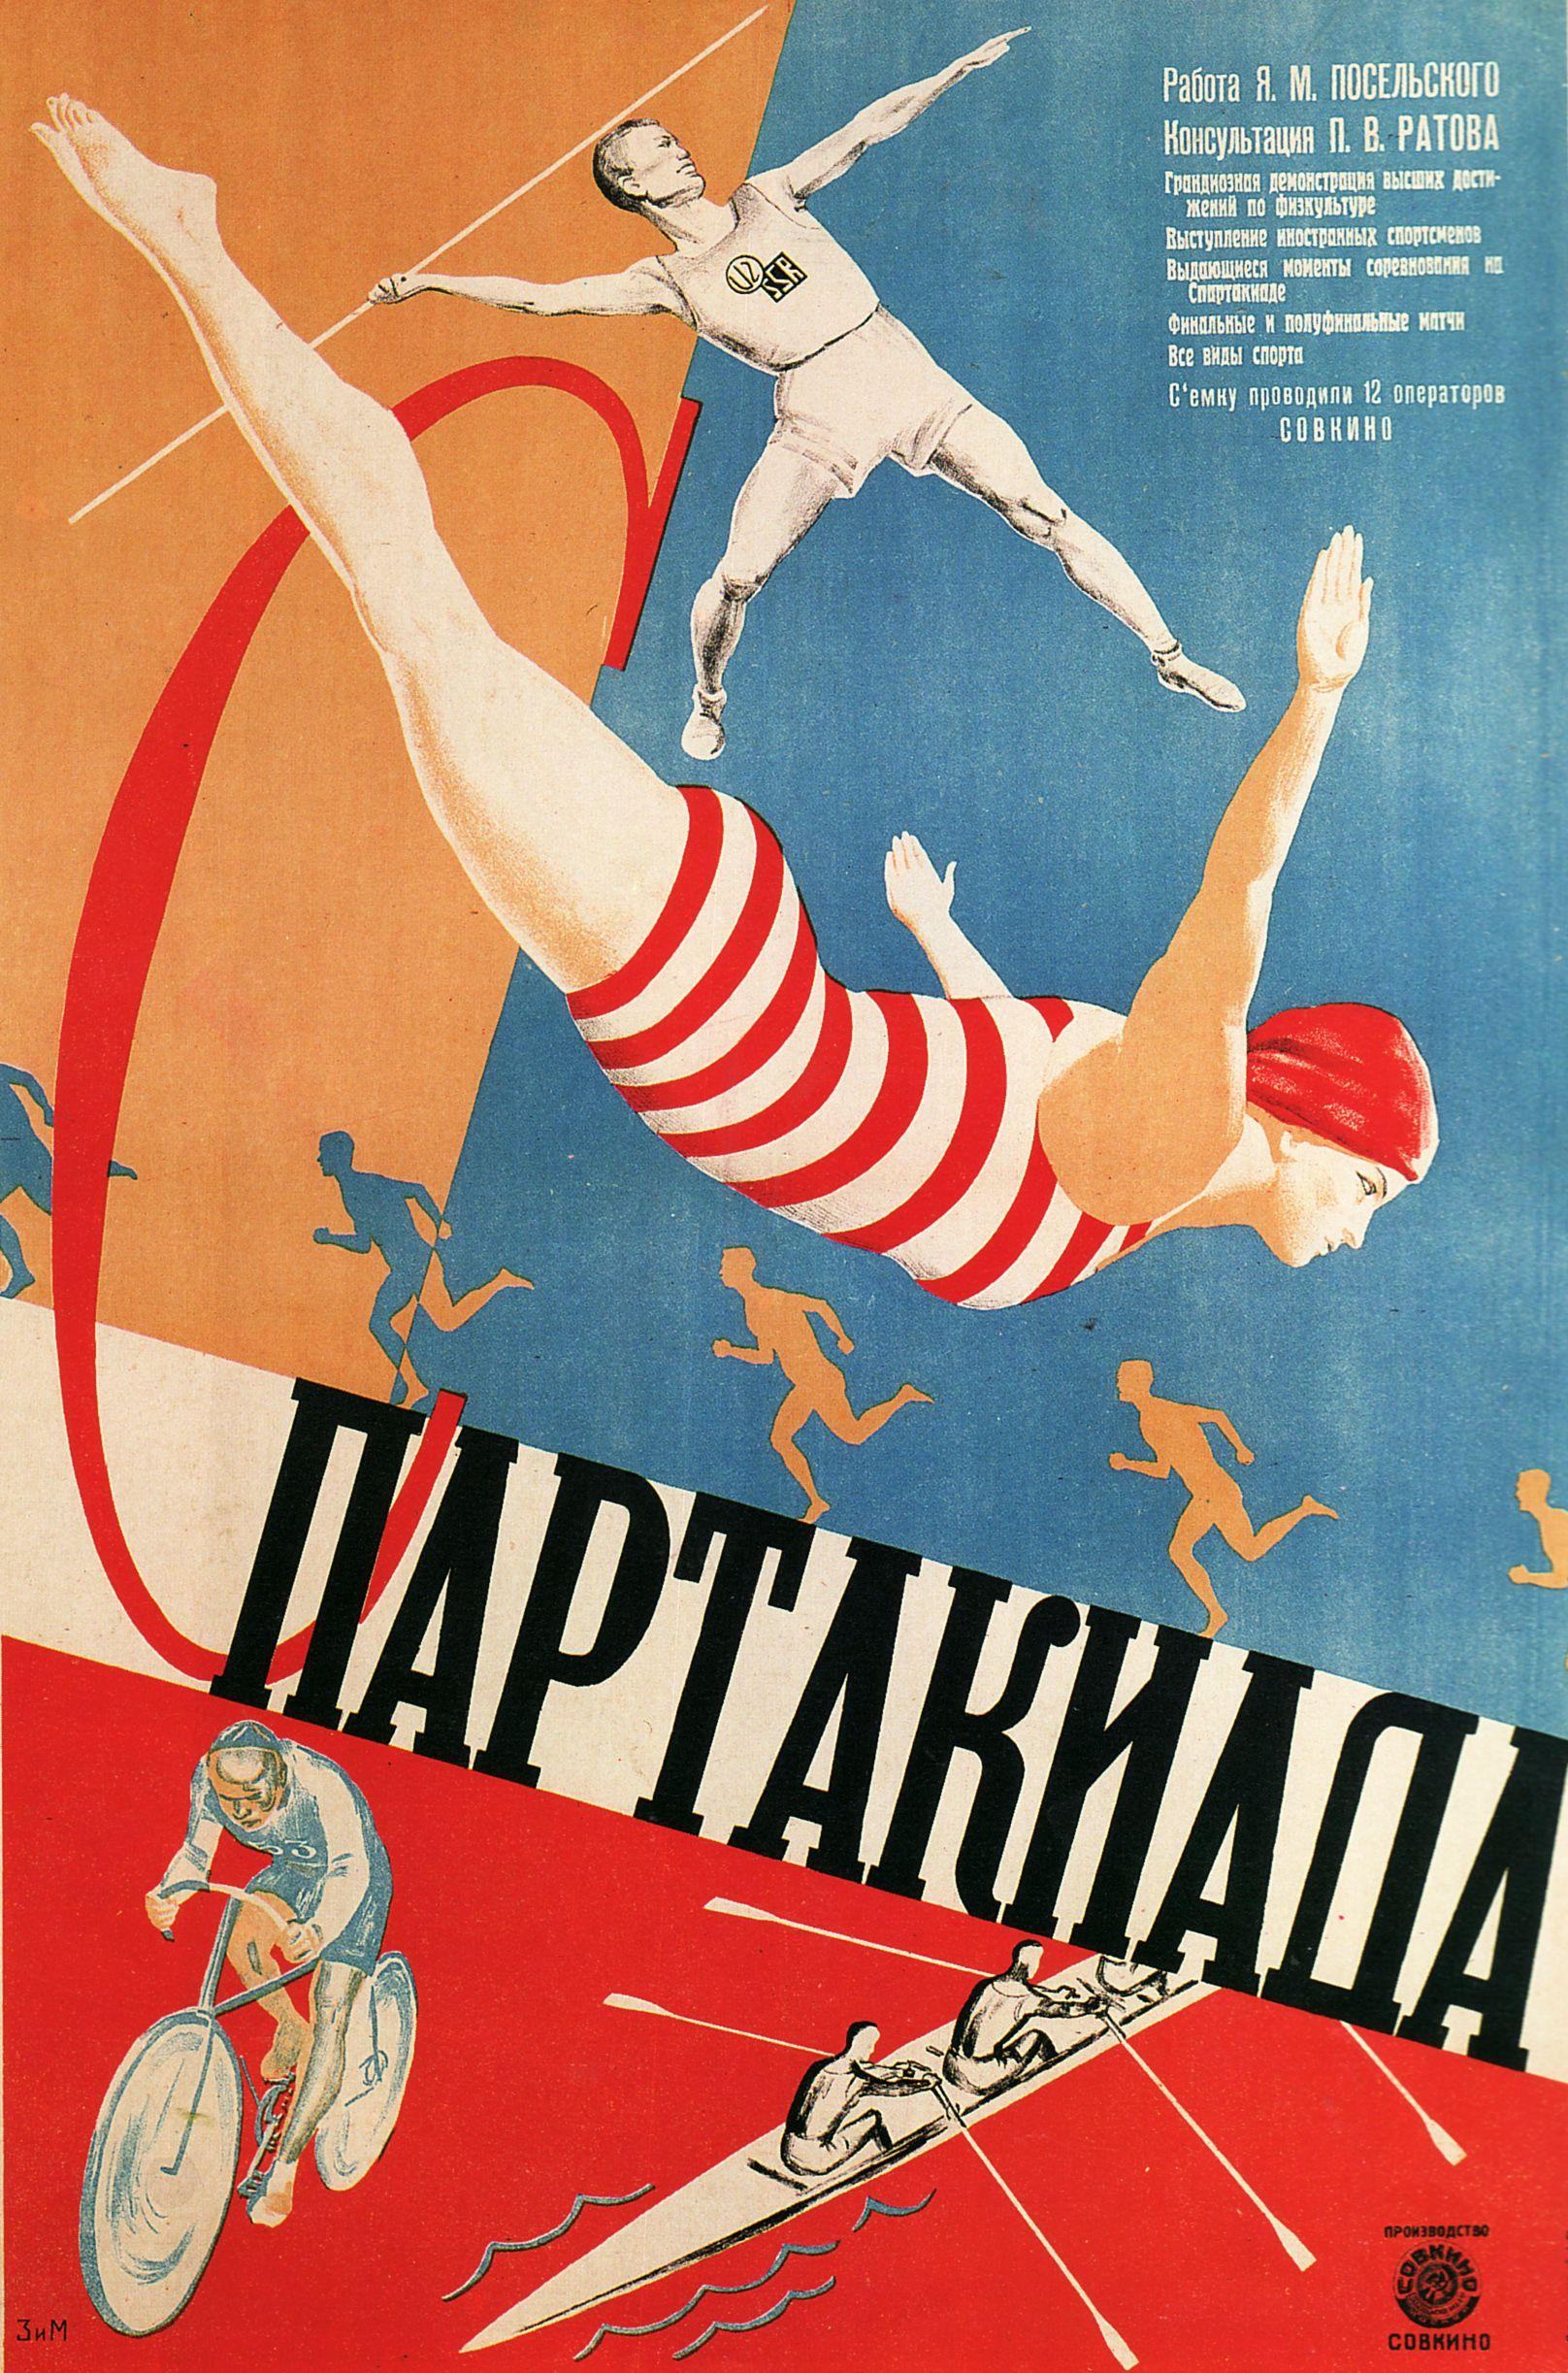 Yuri Makeev: films, biography, roles, work 2